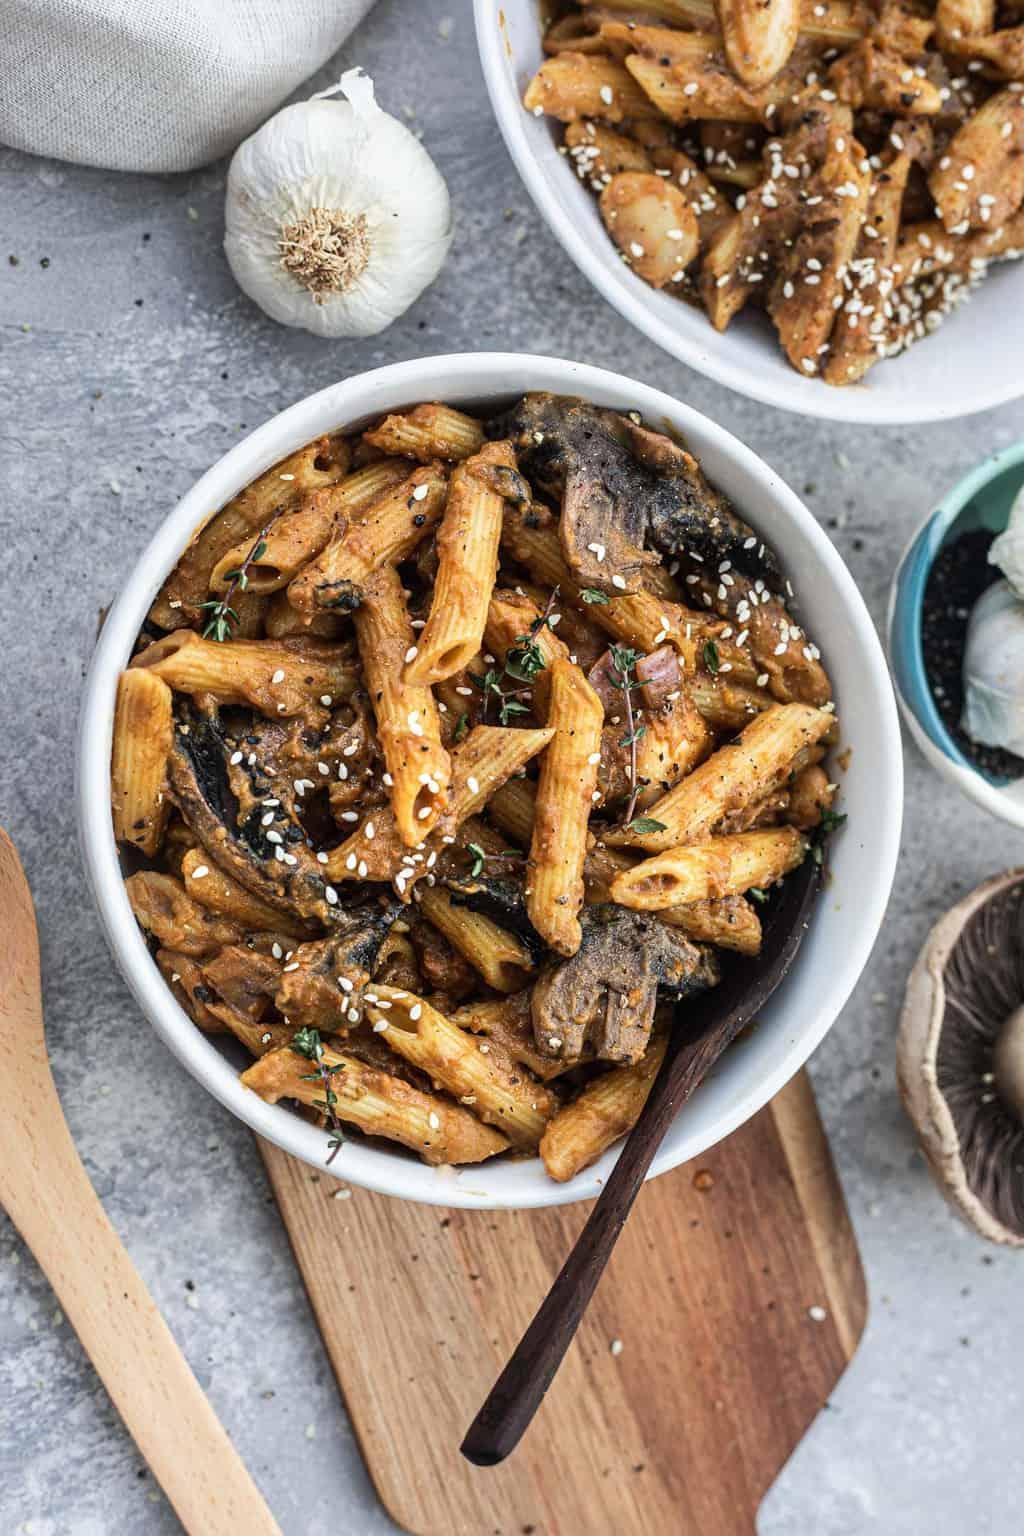 Butter bean pasta with portobello mushrooms